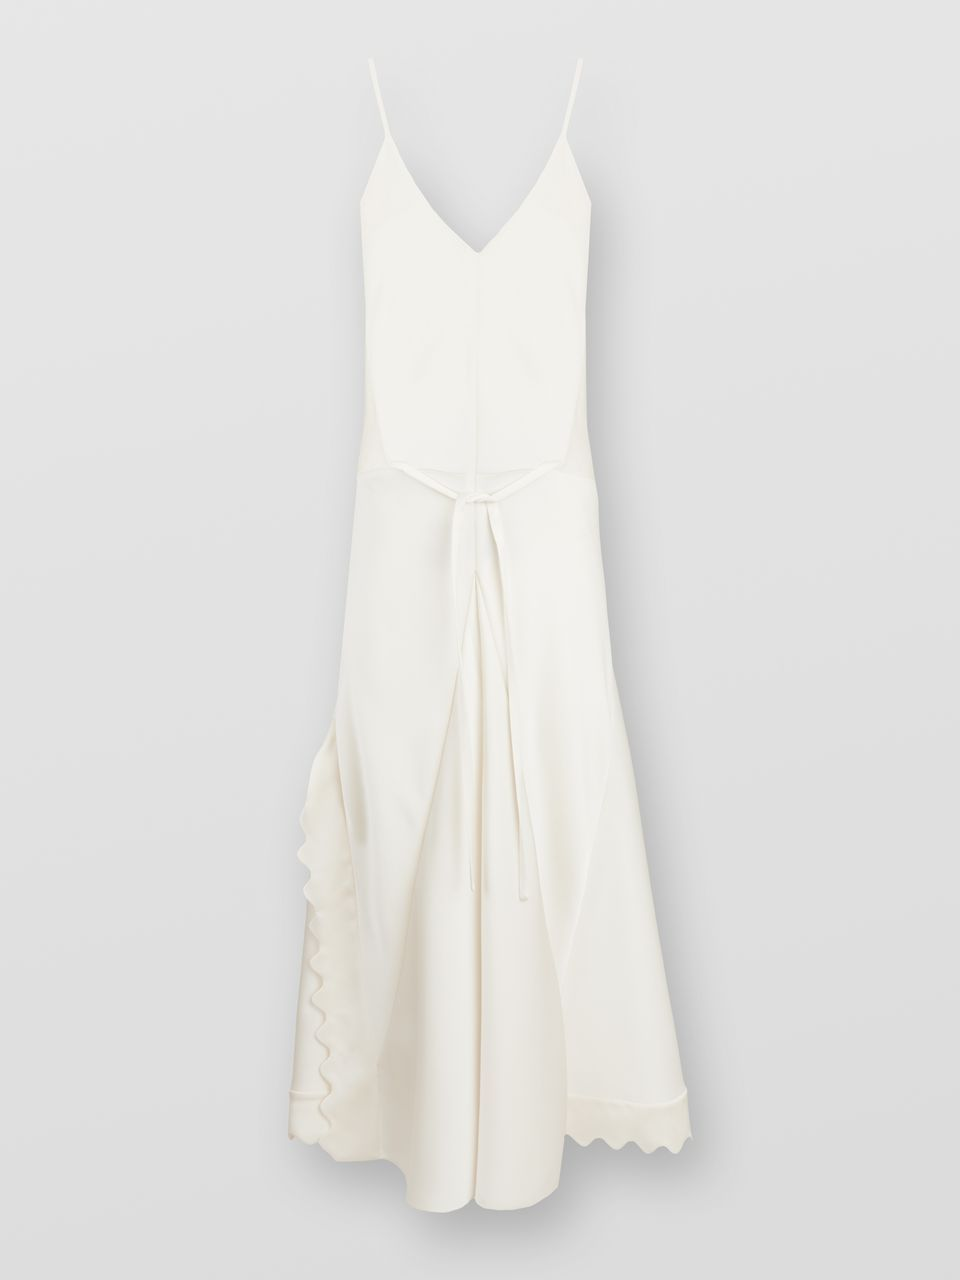 Sleeveless Dress In Satin Crepe With Scalloped Trim Chloe Us Dresses Sleeveless Dress Fashion [ 1280 x 960 Pixel ]